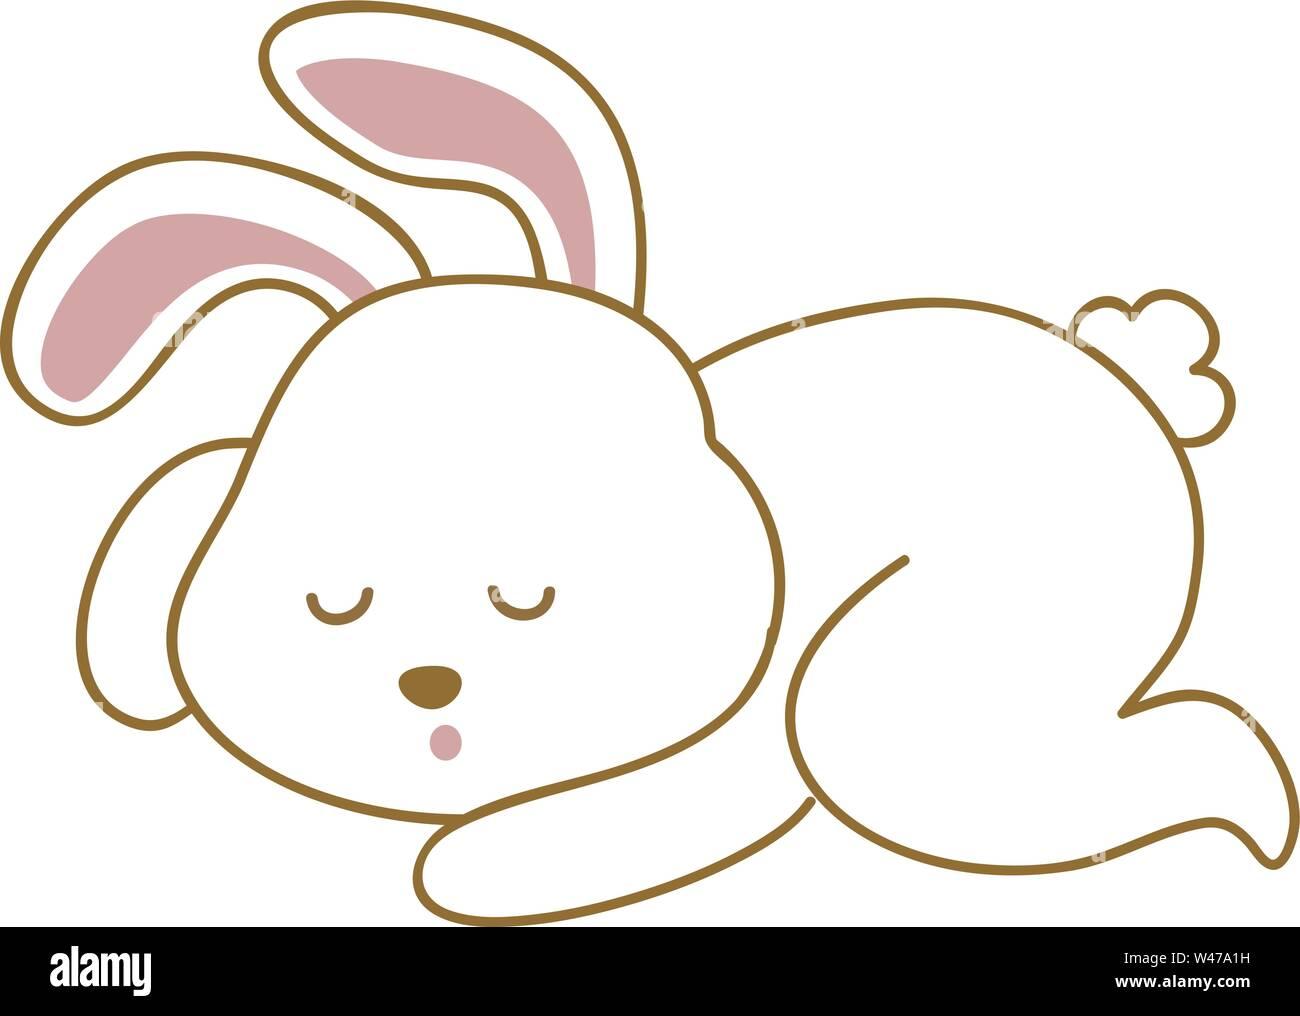 Sleeping bunny, illustration, vector on white background. Stock Vector